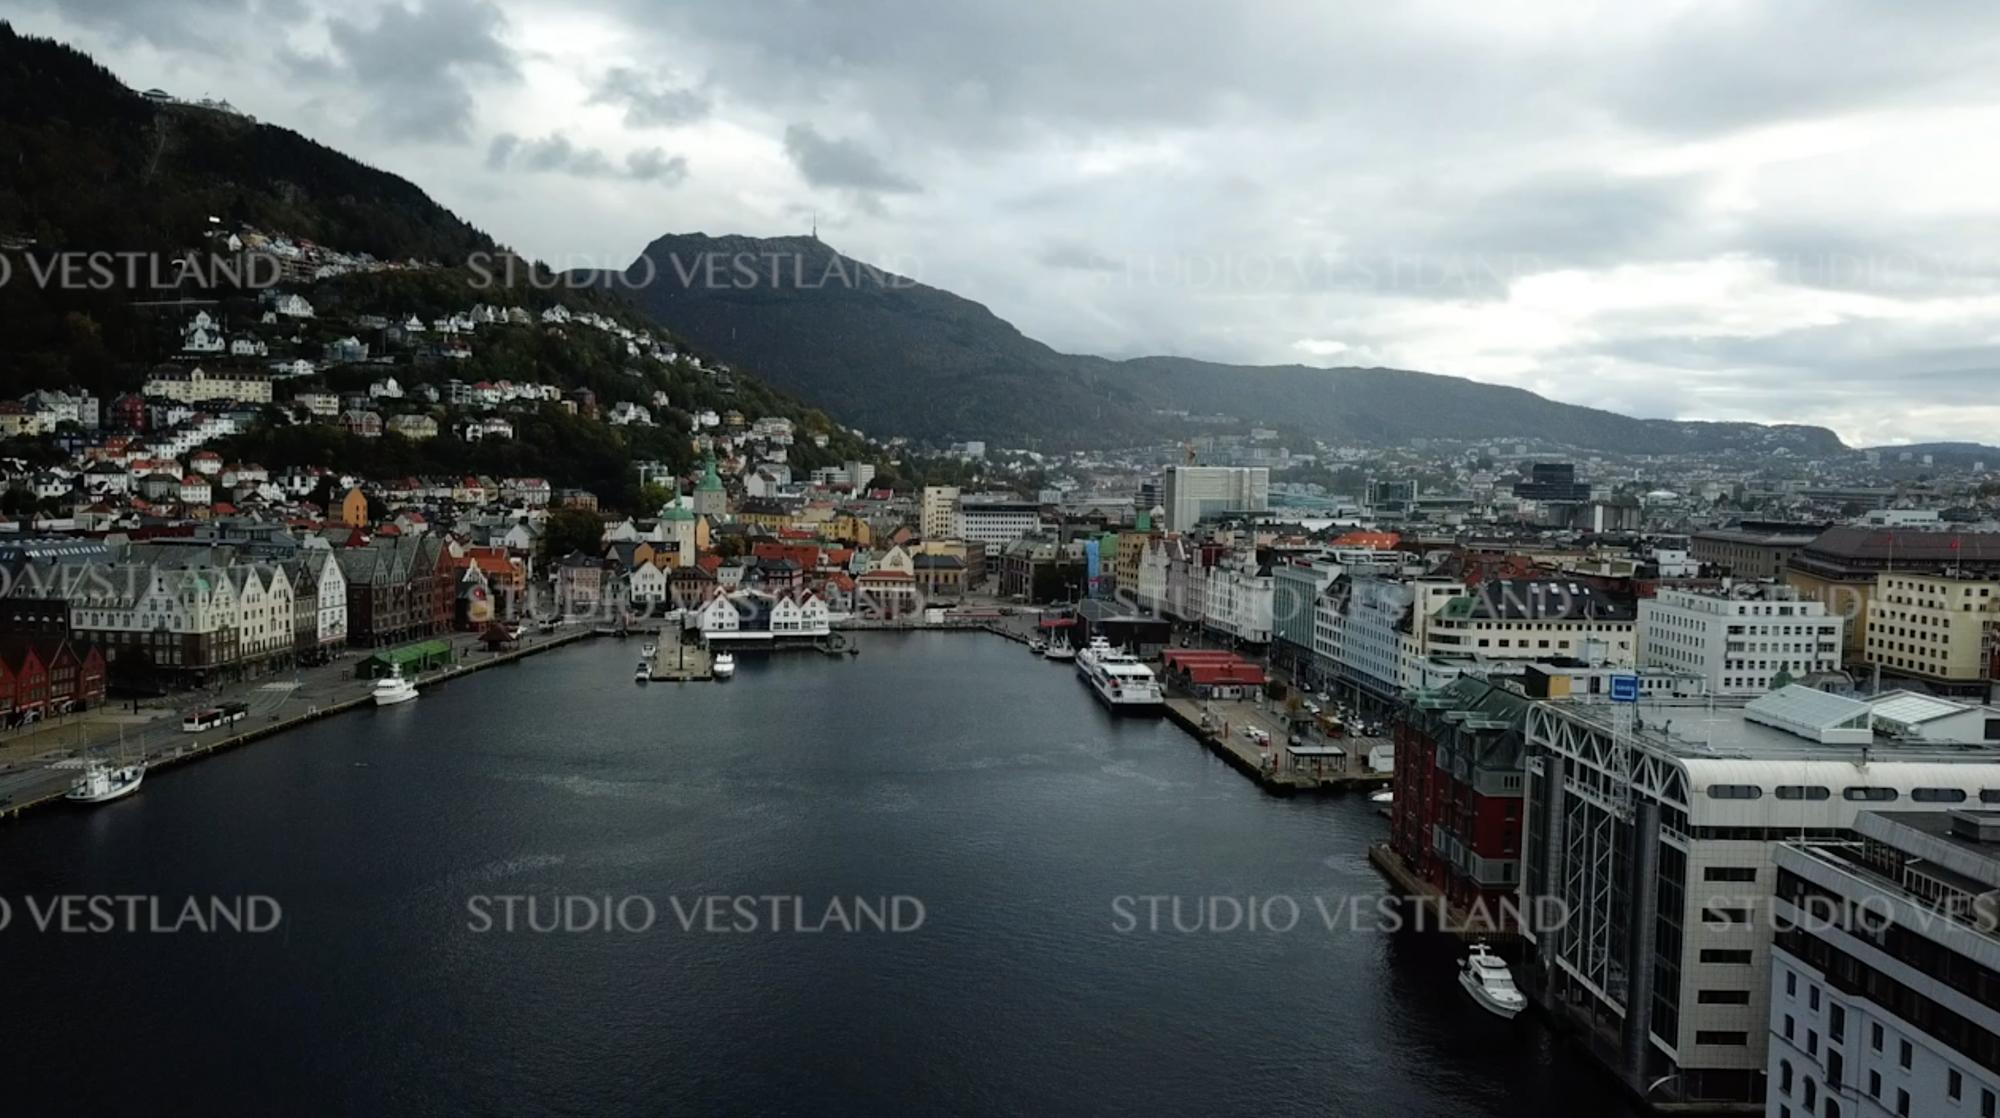 Studio Vestland - Bergen V14